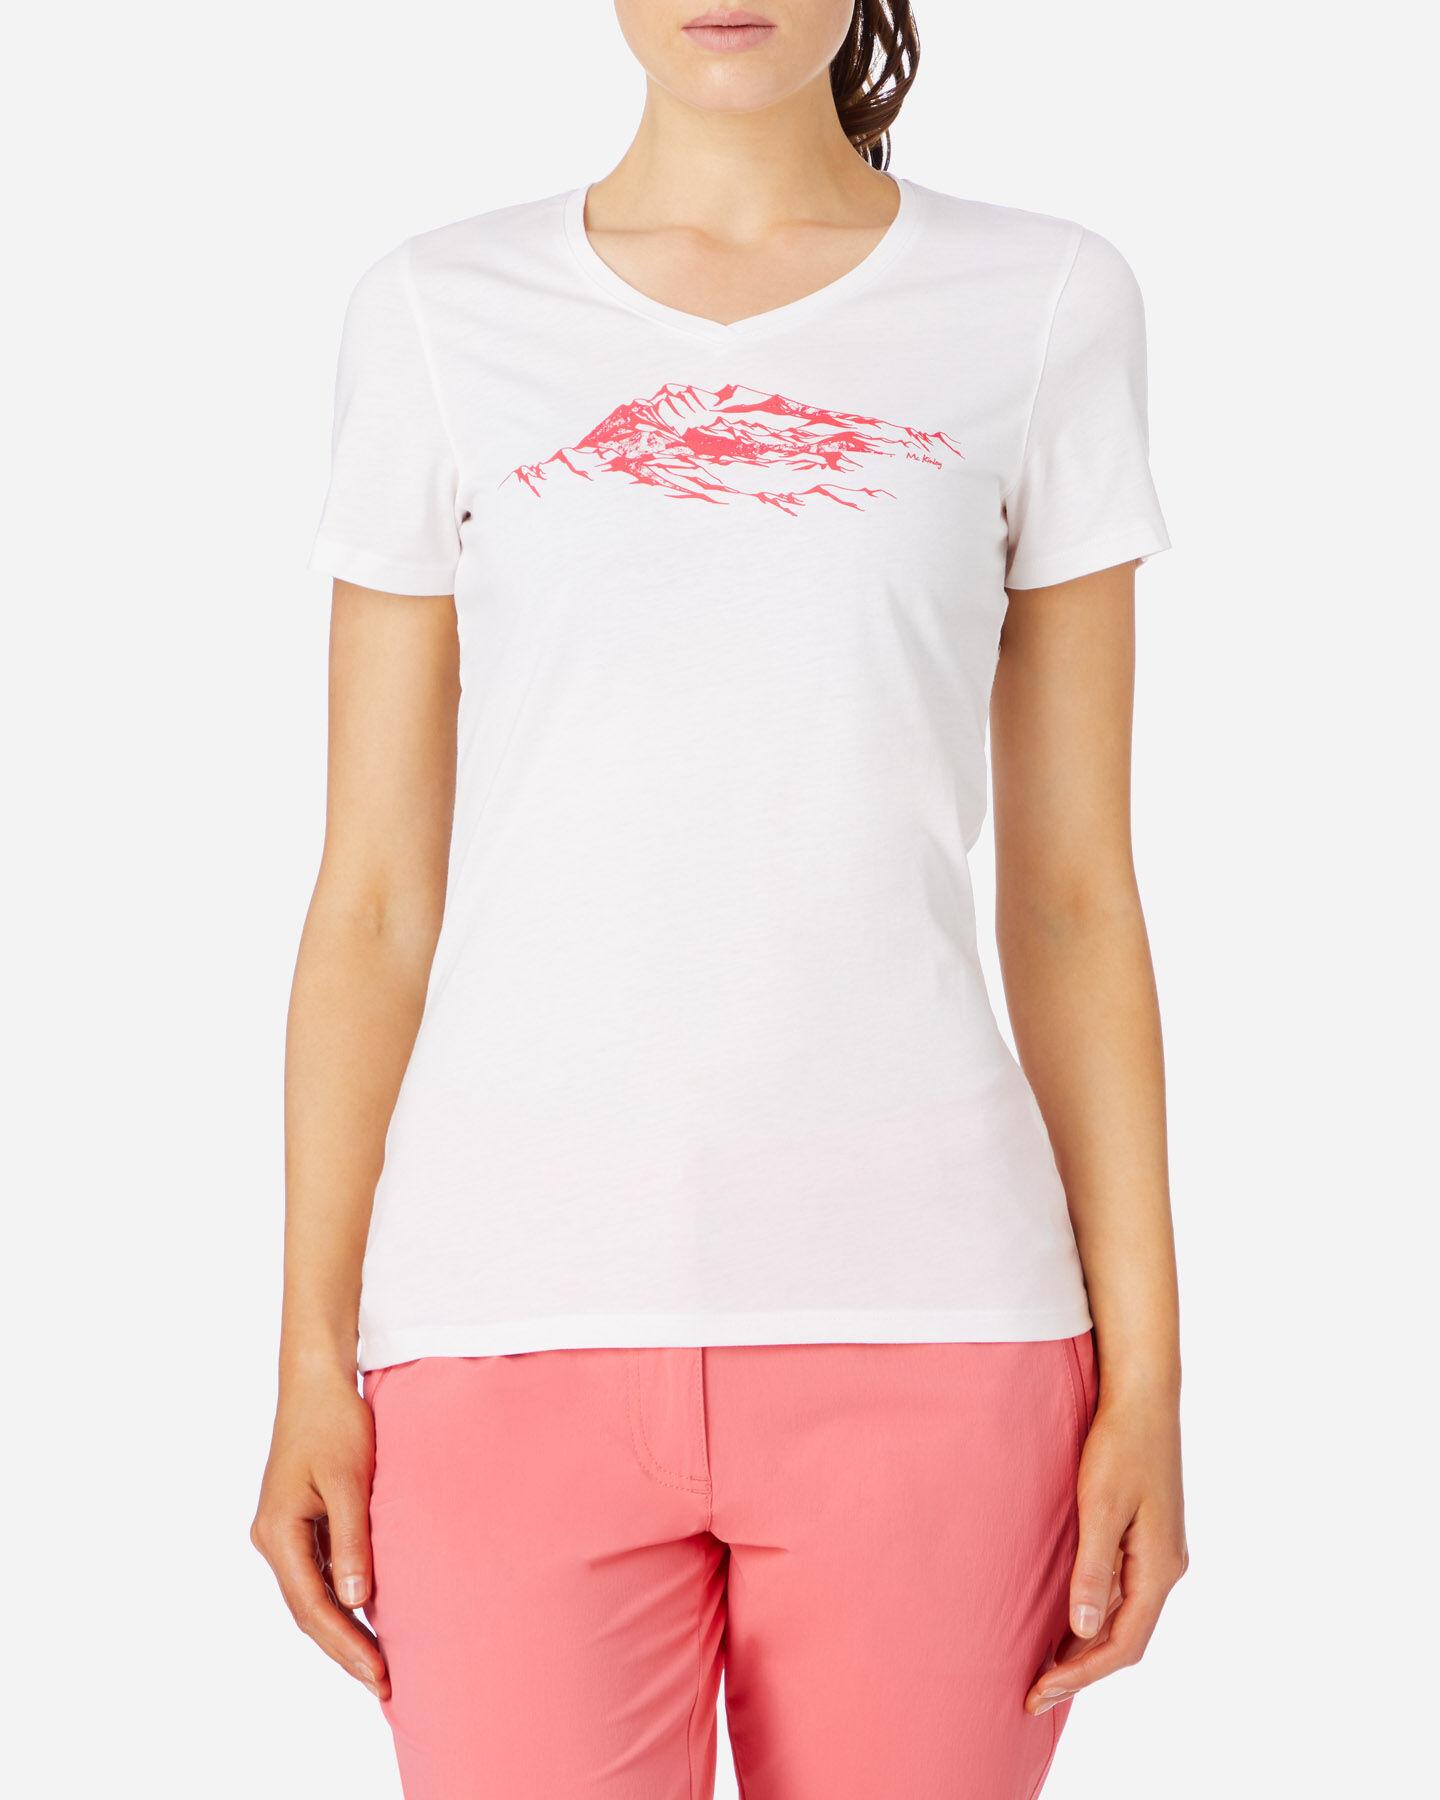 T-Shirt MCKINLEY KULMA W S5266688 scatto 1